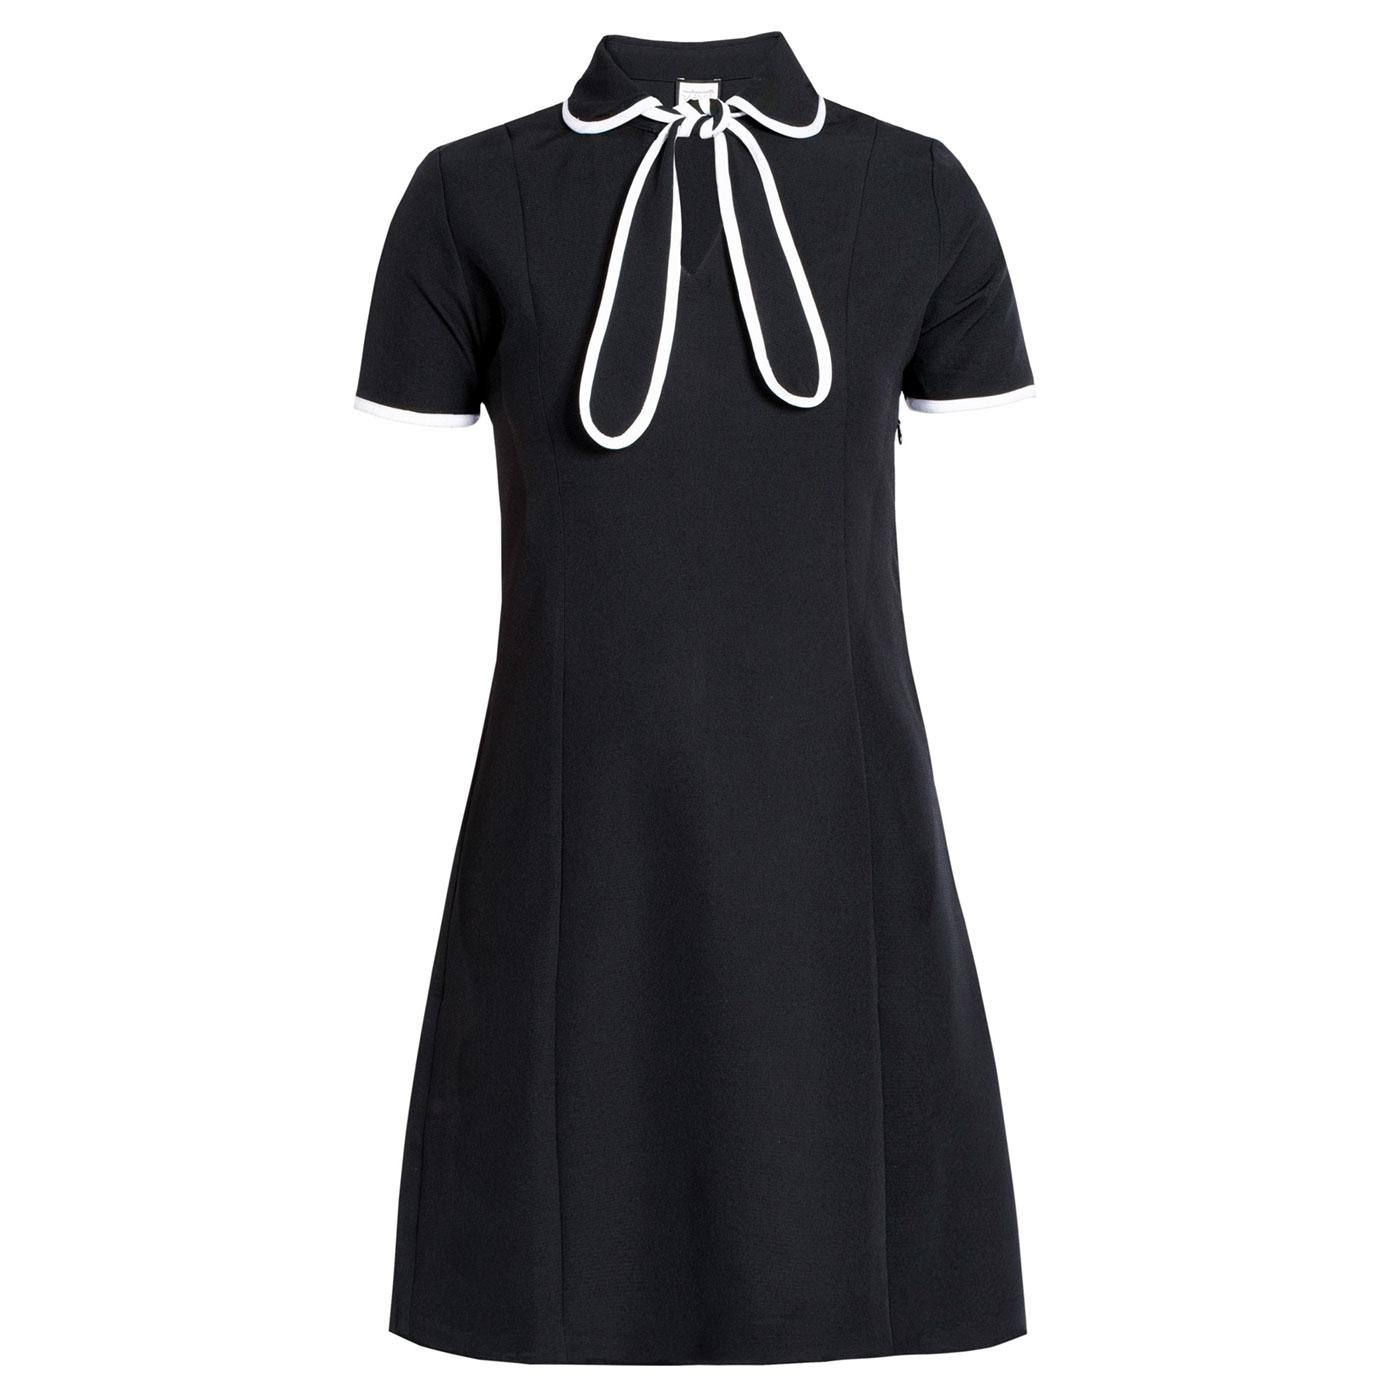 Subtle Rebellion MADEMOISELLE YEYE 60s Mod Dress M